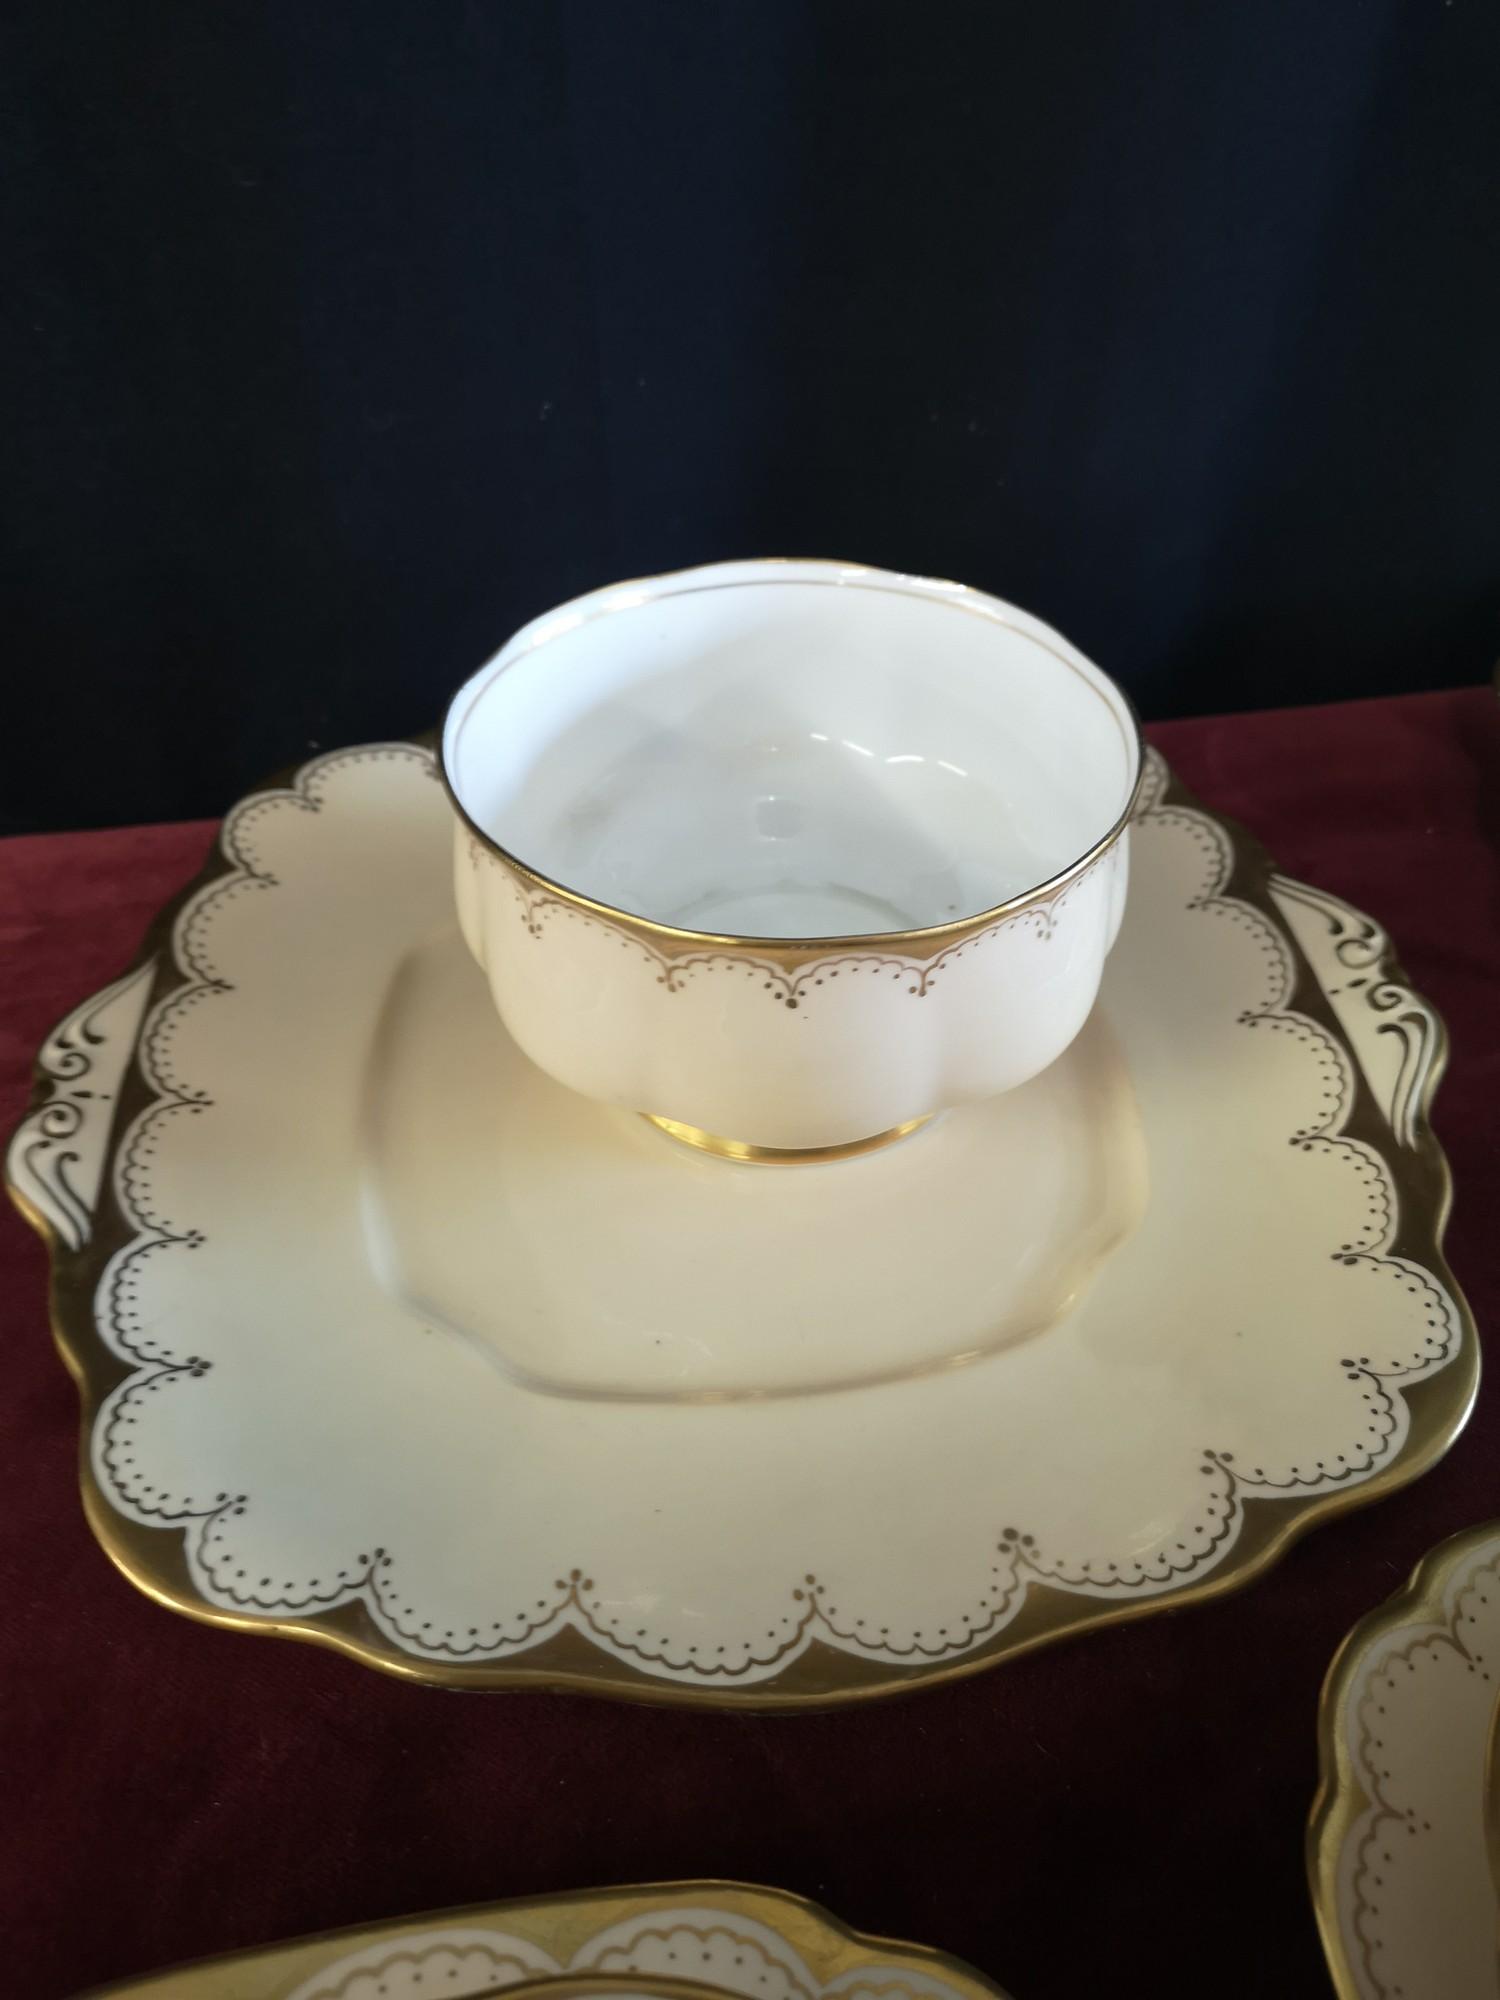 Large 1900s Royal Albert gilt tea set, set in cream back ground. - Image 4 of 10